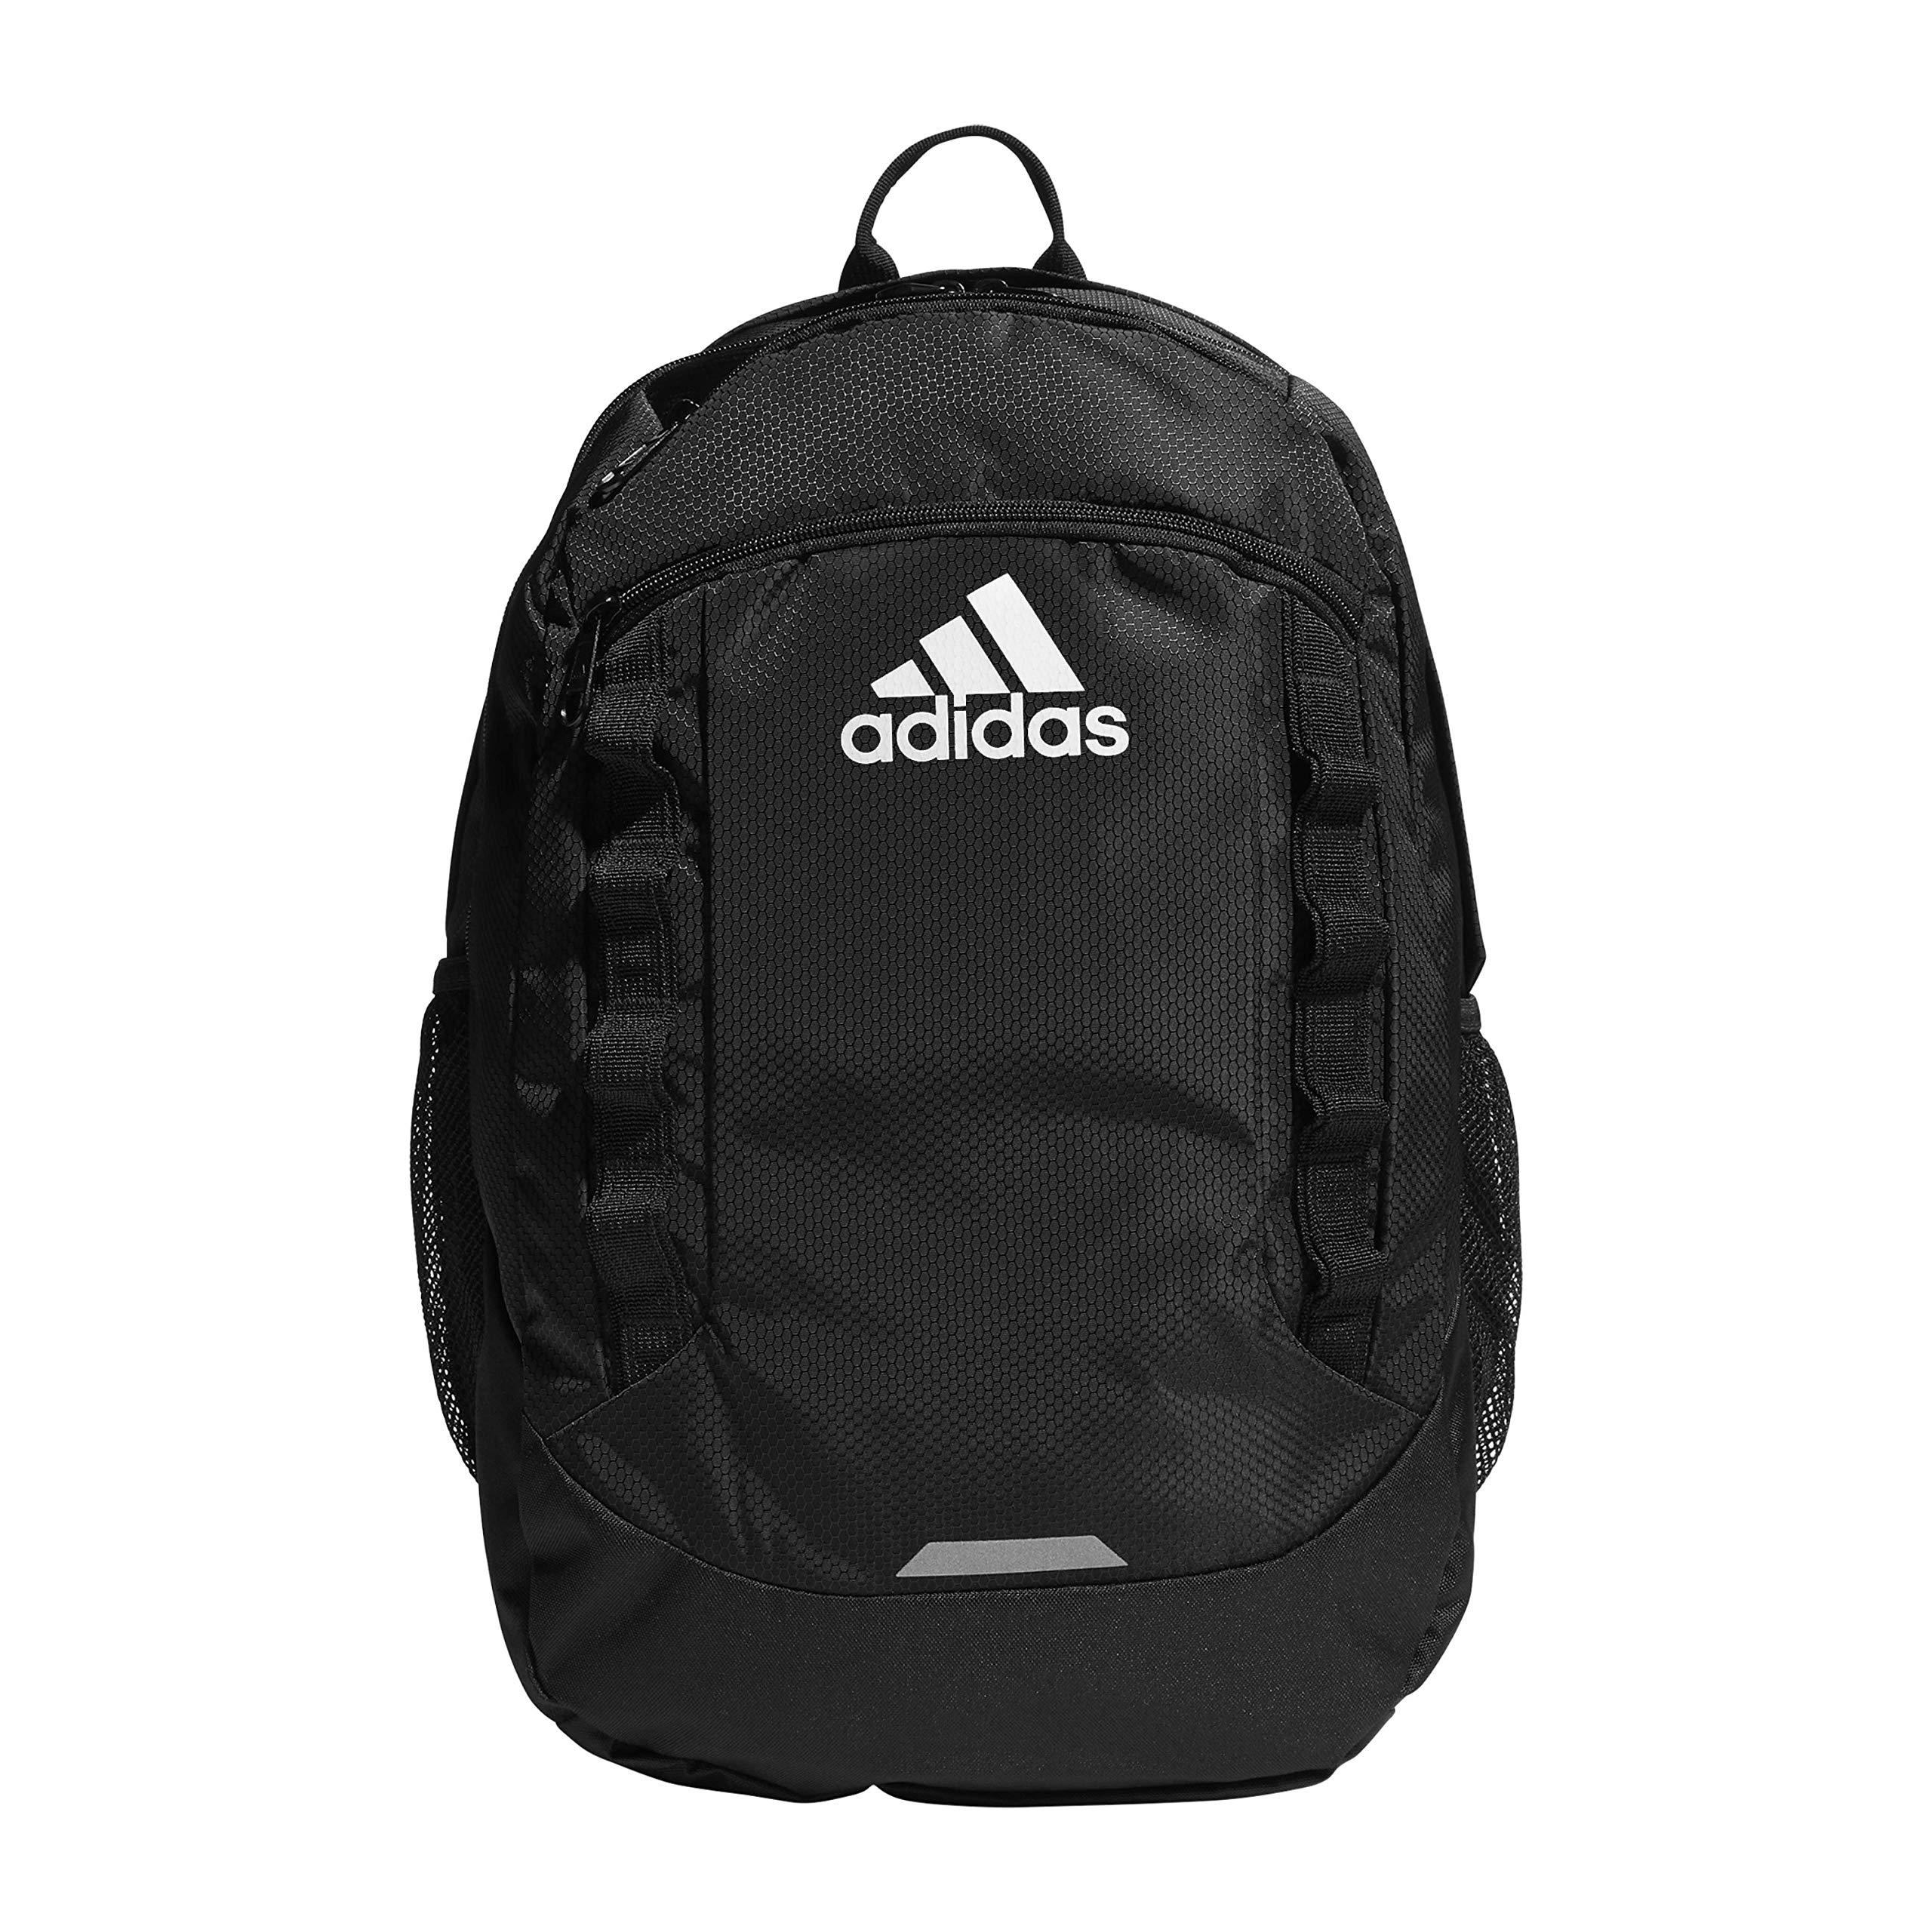 adidas Excel Backpack Black Size